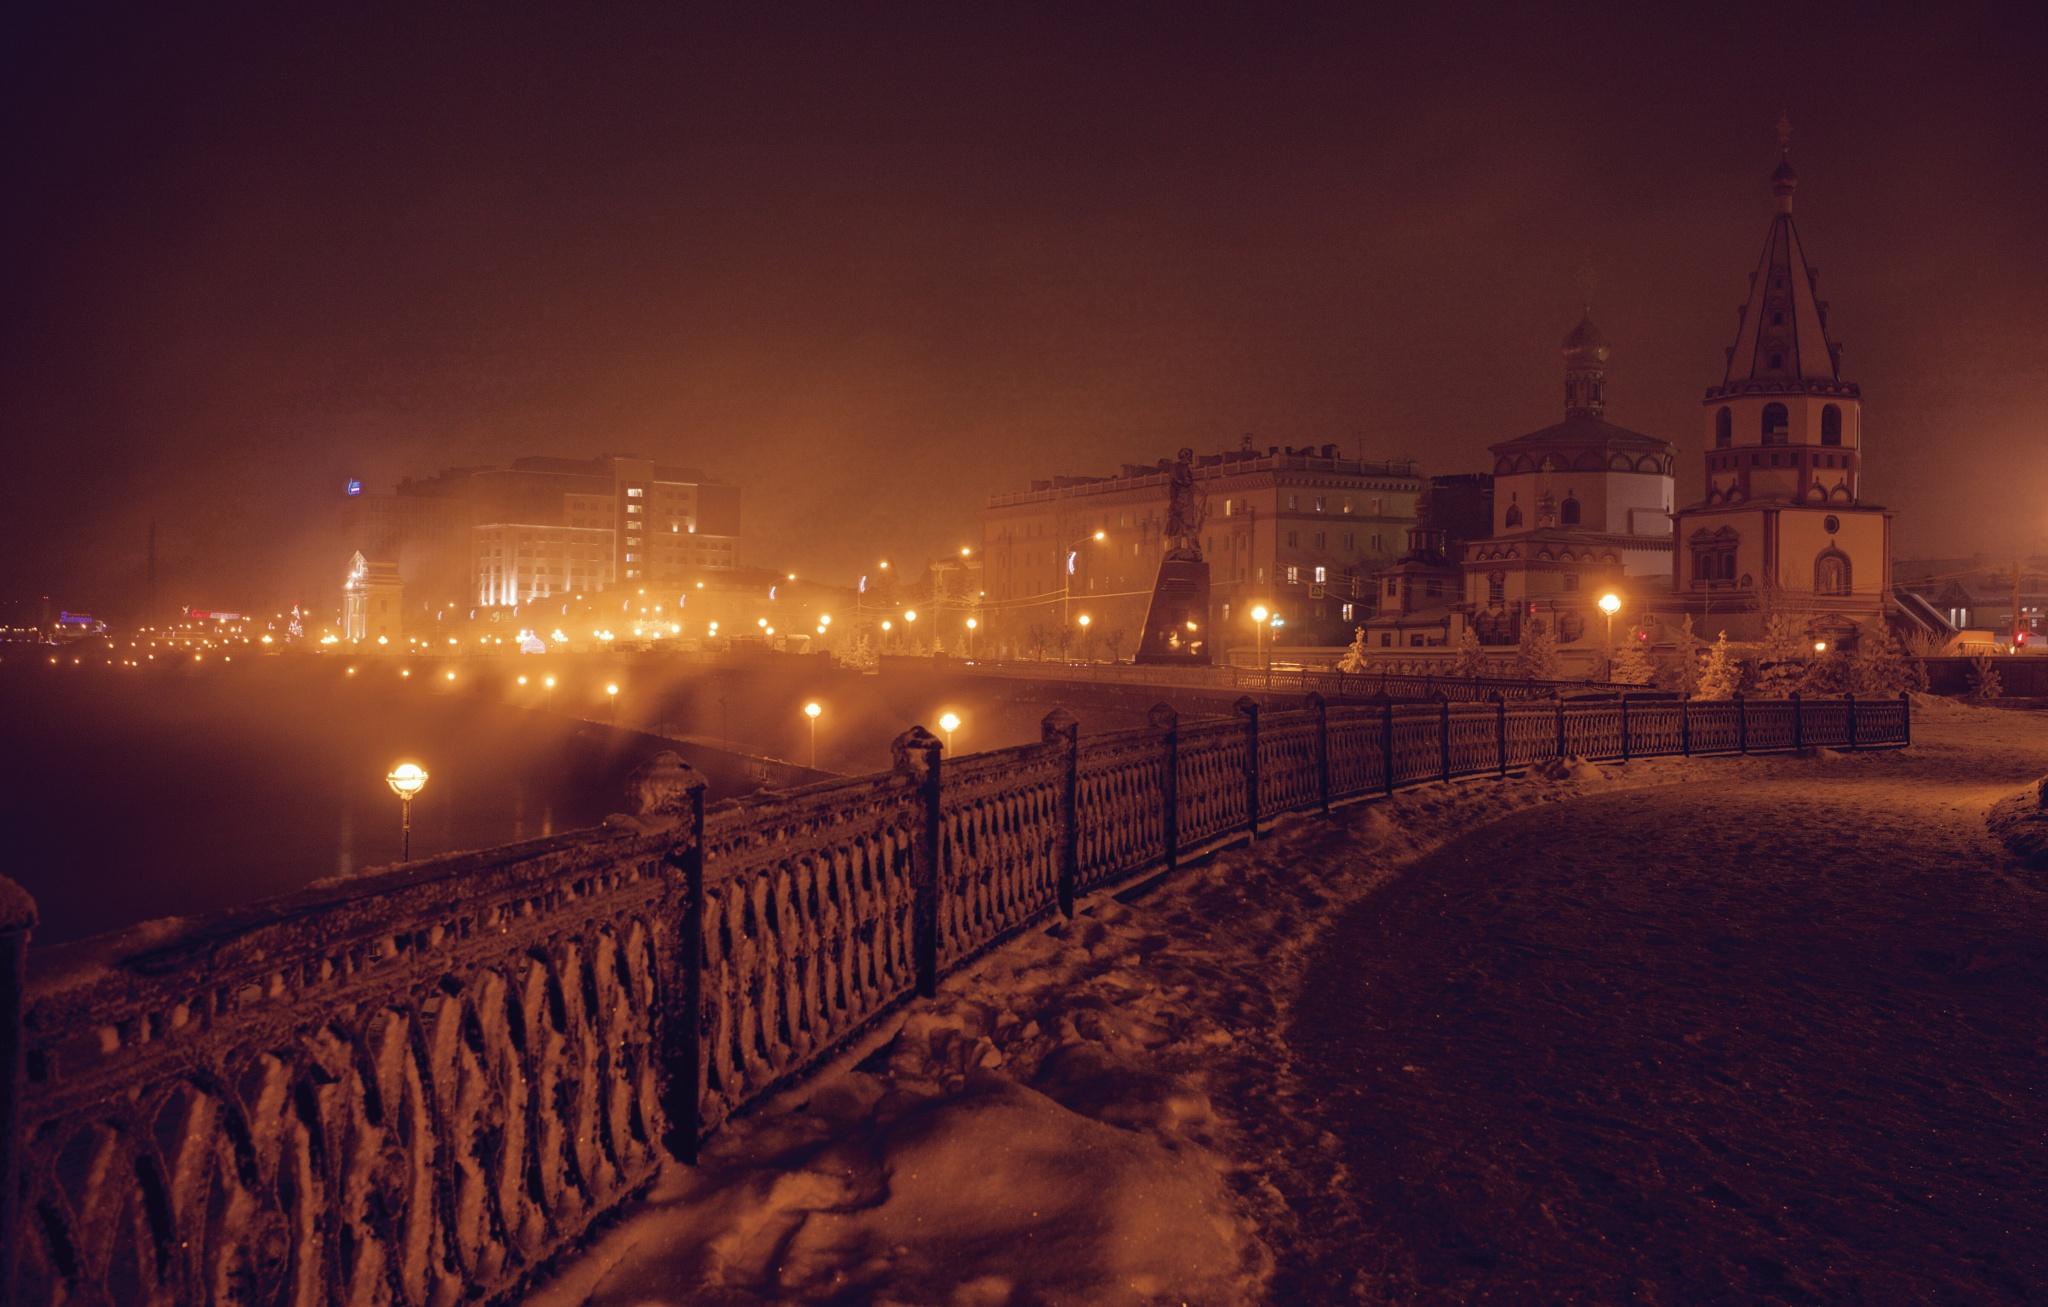 Misty Irkutsk by Boris Konovalov